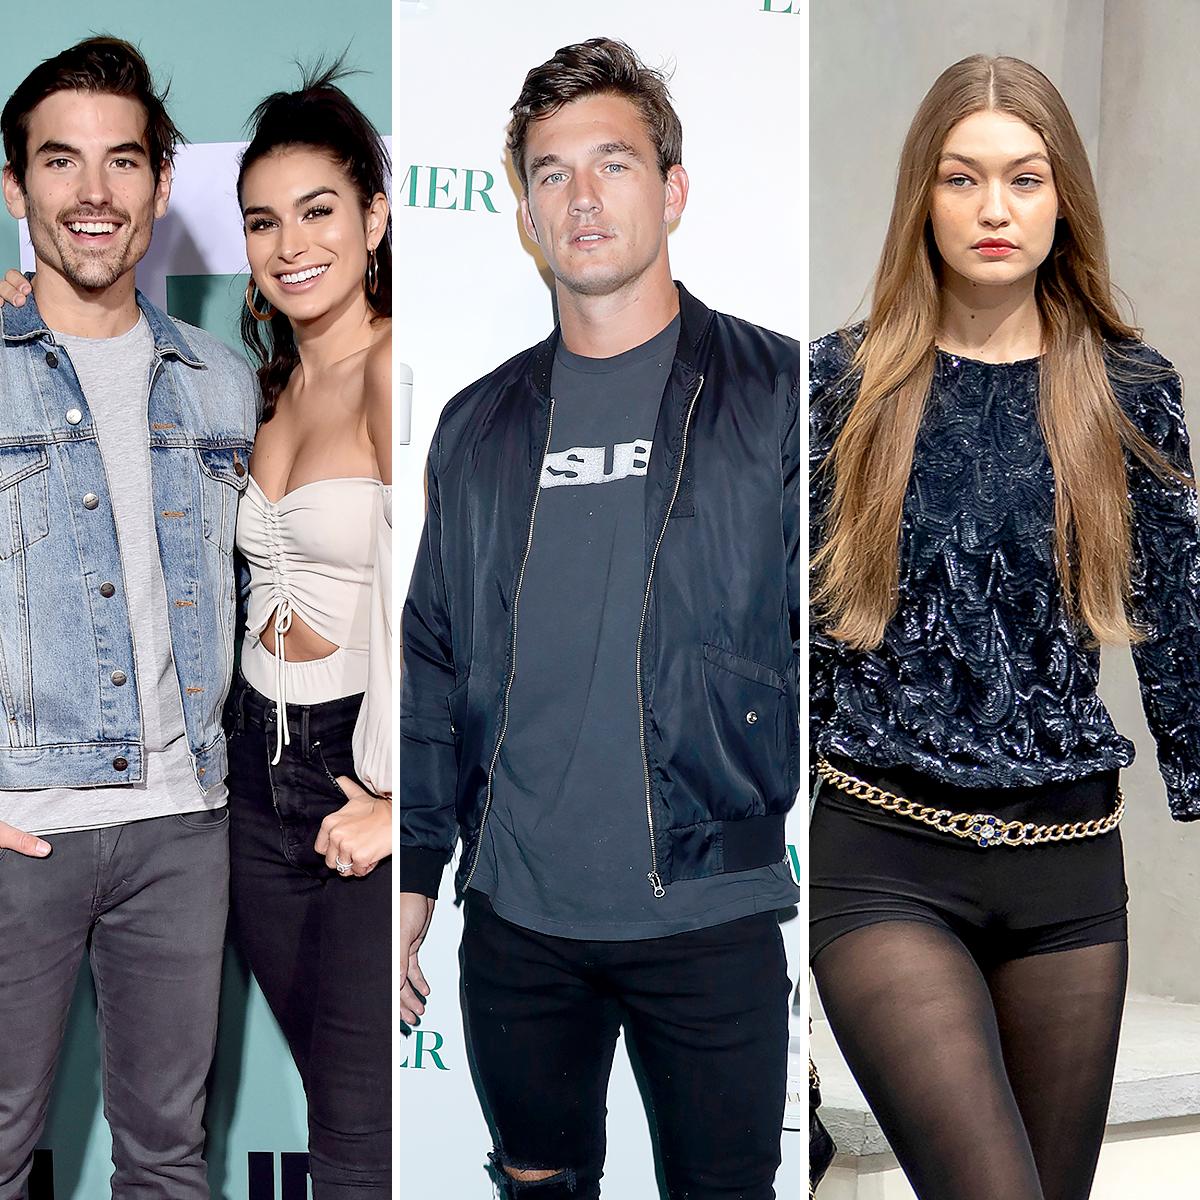 Ashley-Iaconetti-and-Jared-Haibon-Are-Very-Sad-Over-Tyler-Cameron-and-Gigi-Hadid-Split